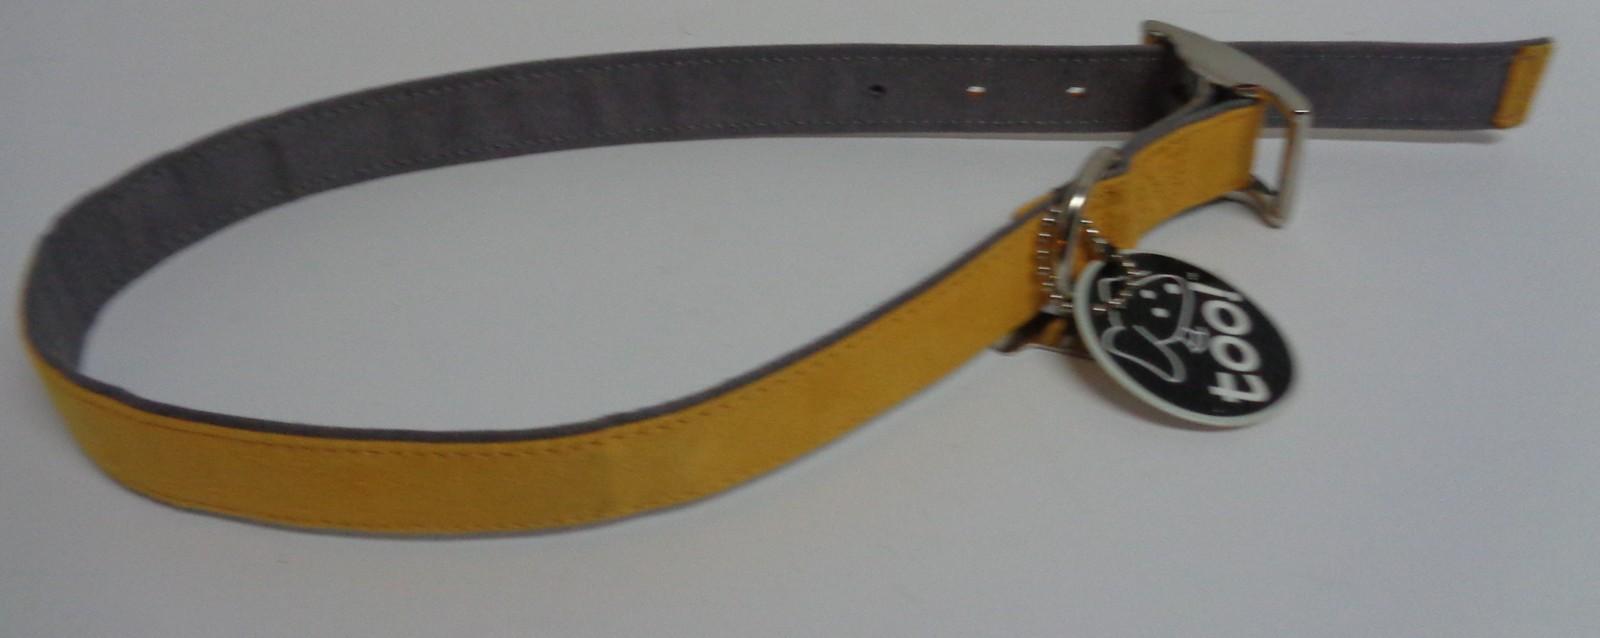 "Large Breed 26"" Leather Dog Collar Yellow NWT"